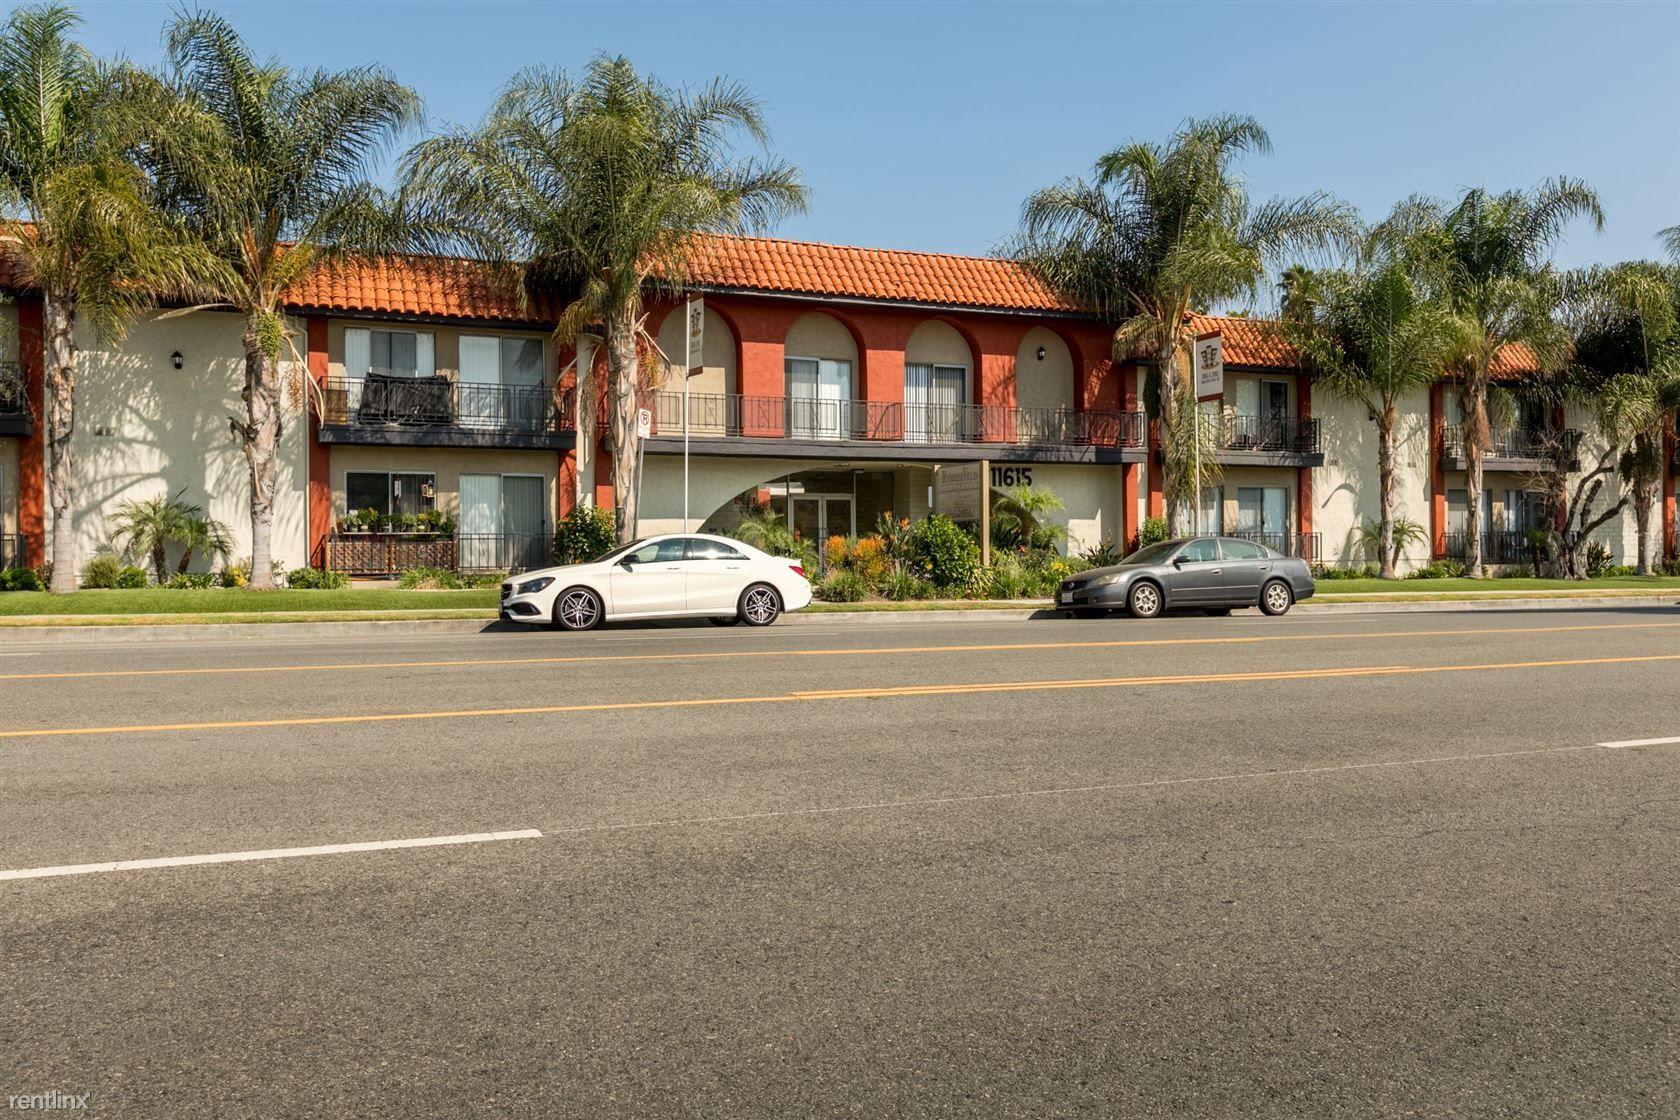 Riverside Villas Apartments